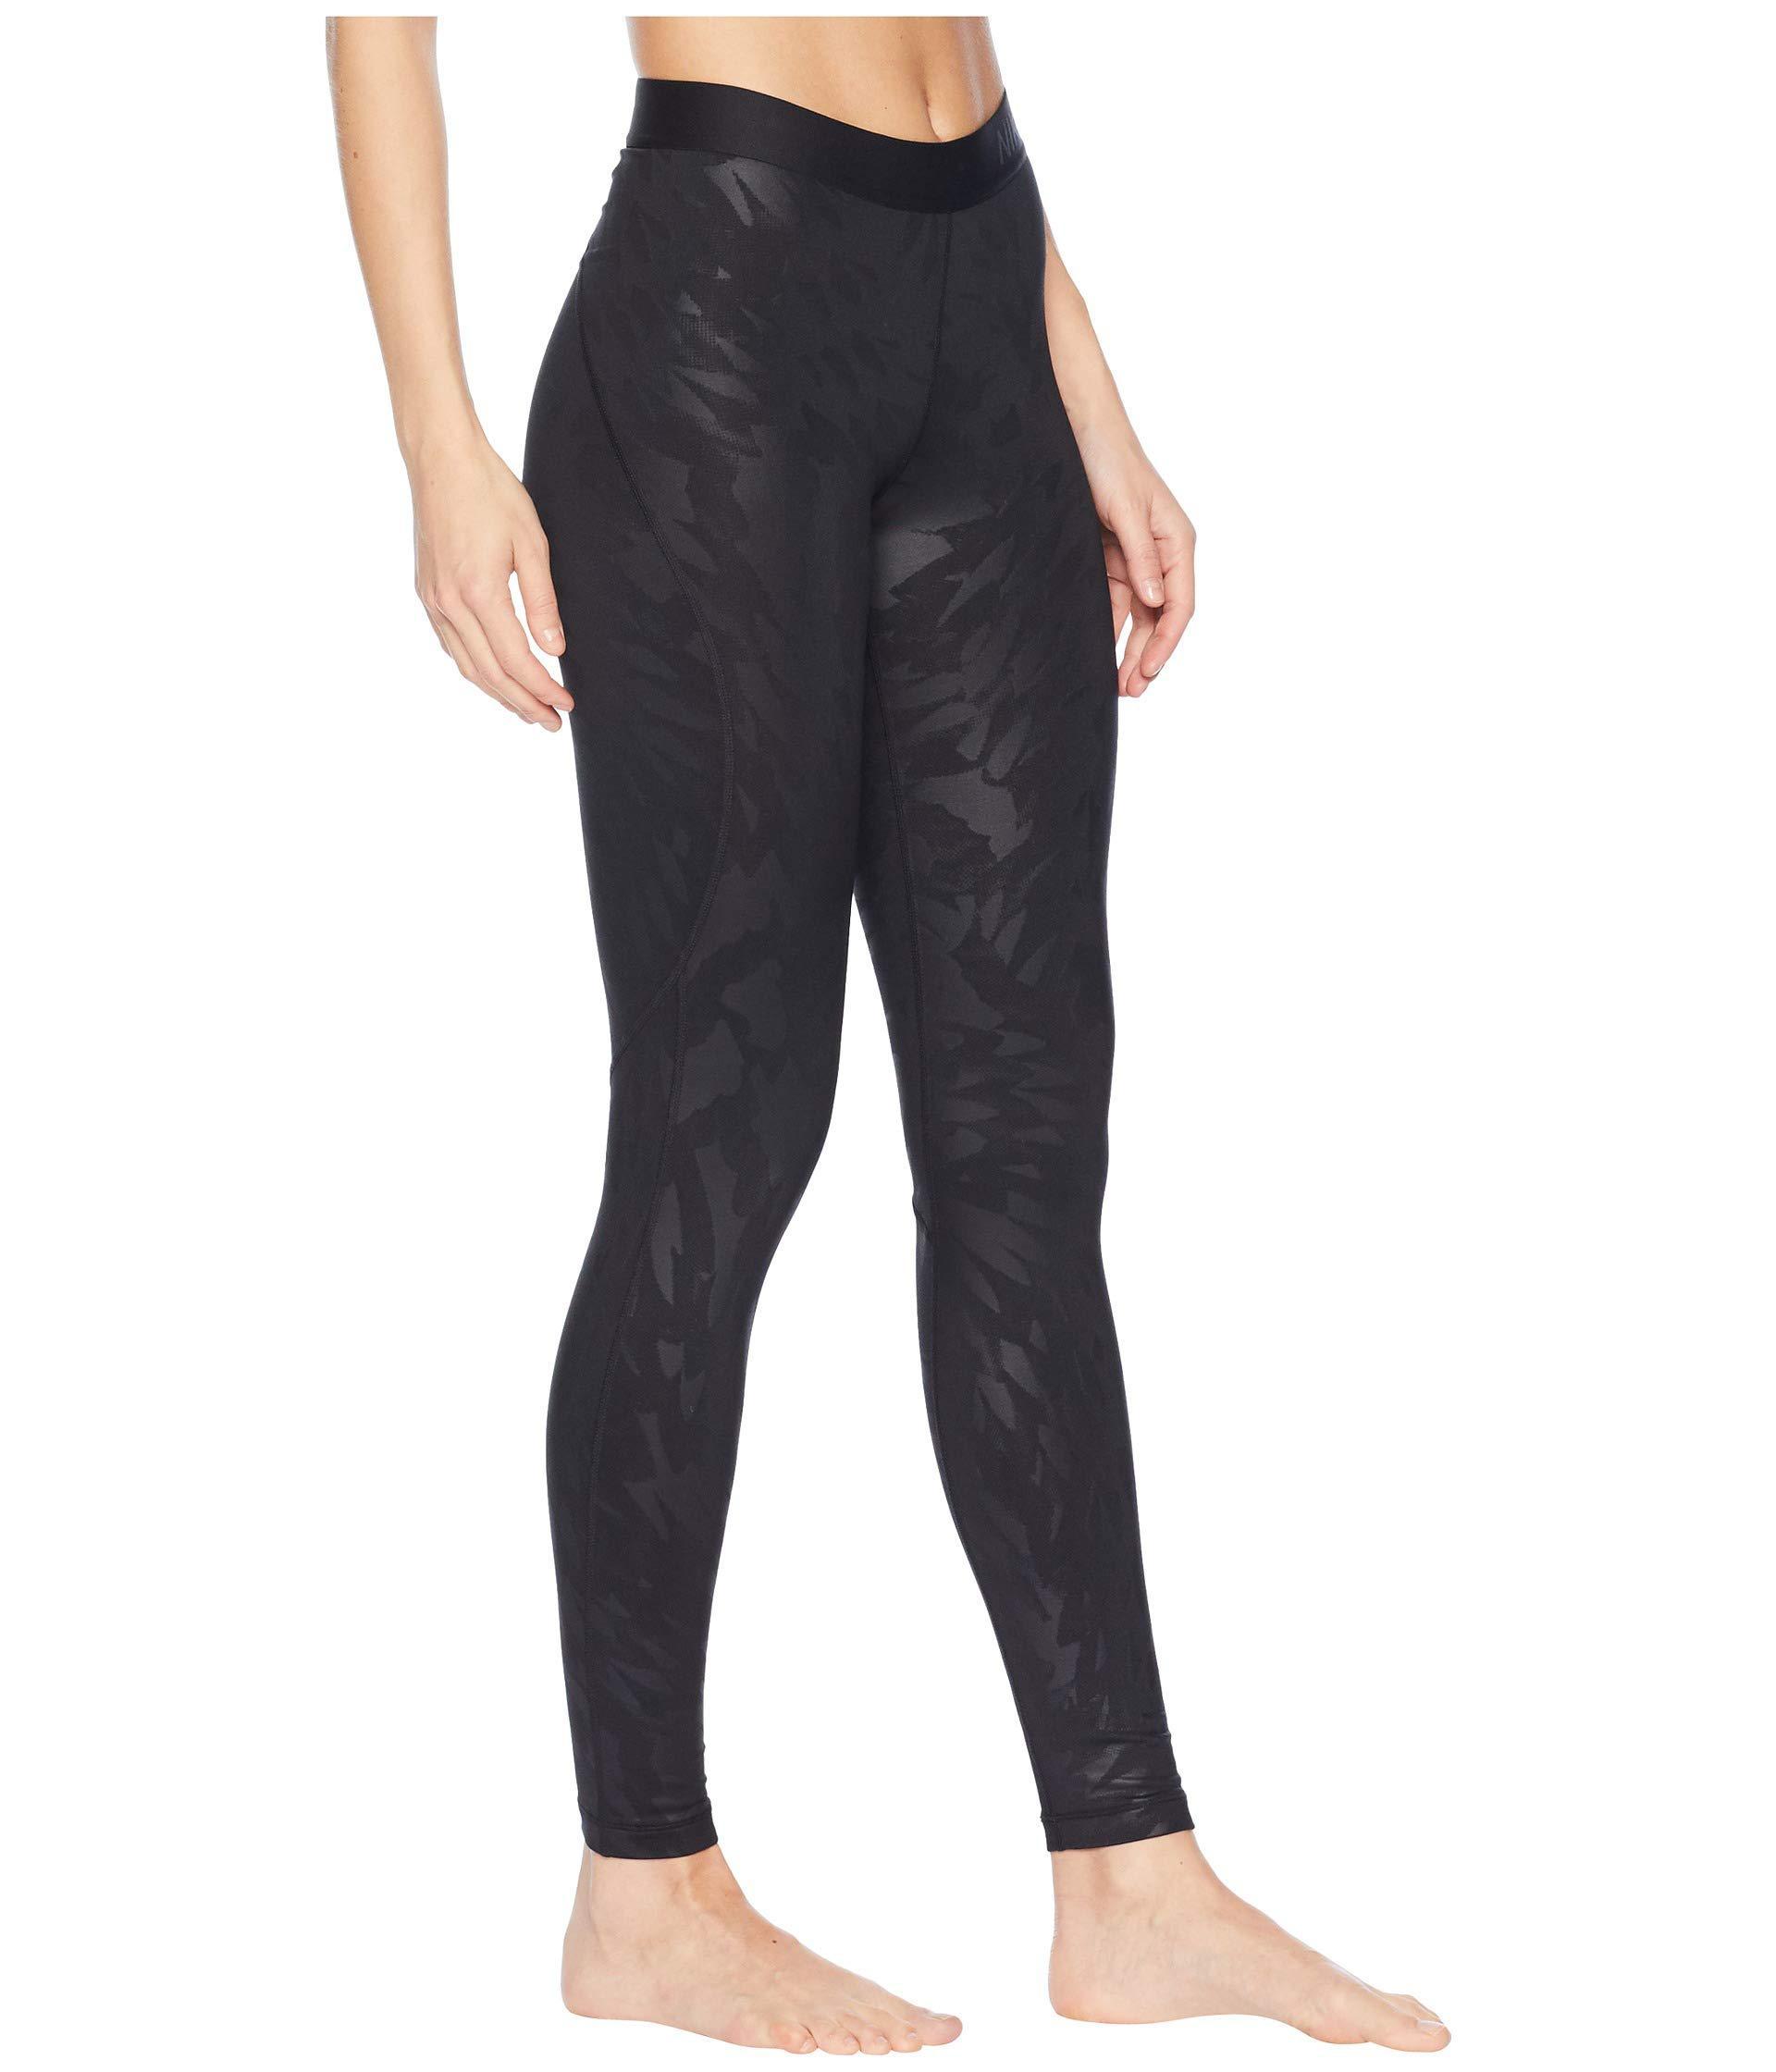 aeb363dd5f2f3 Nike Pro Warm Embossed Wing Tights (black/black) Women's Casual ...